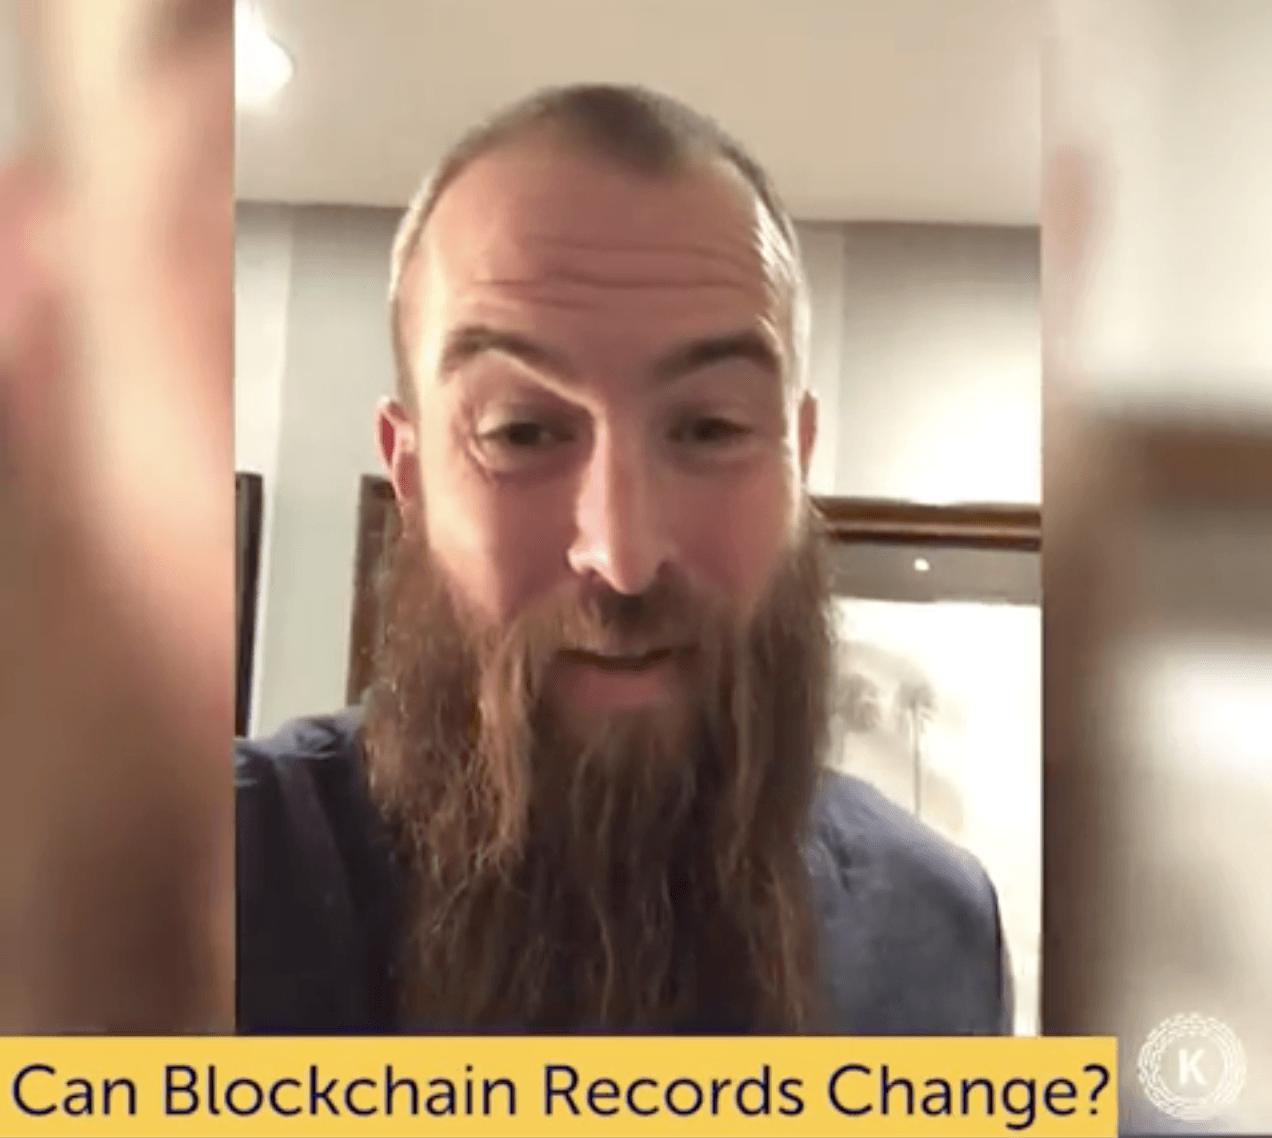 Can Blockchain Records Change